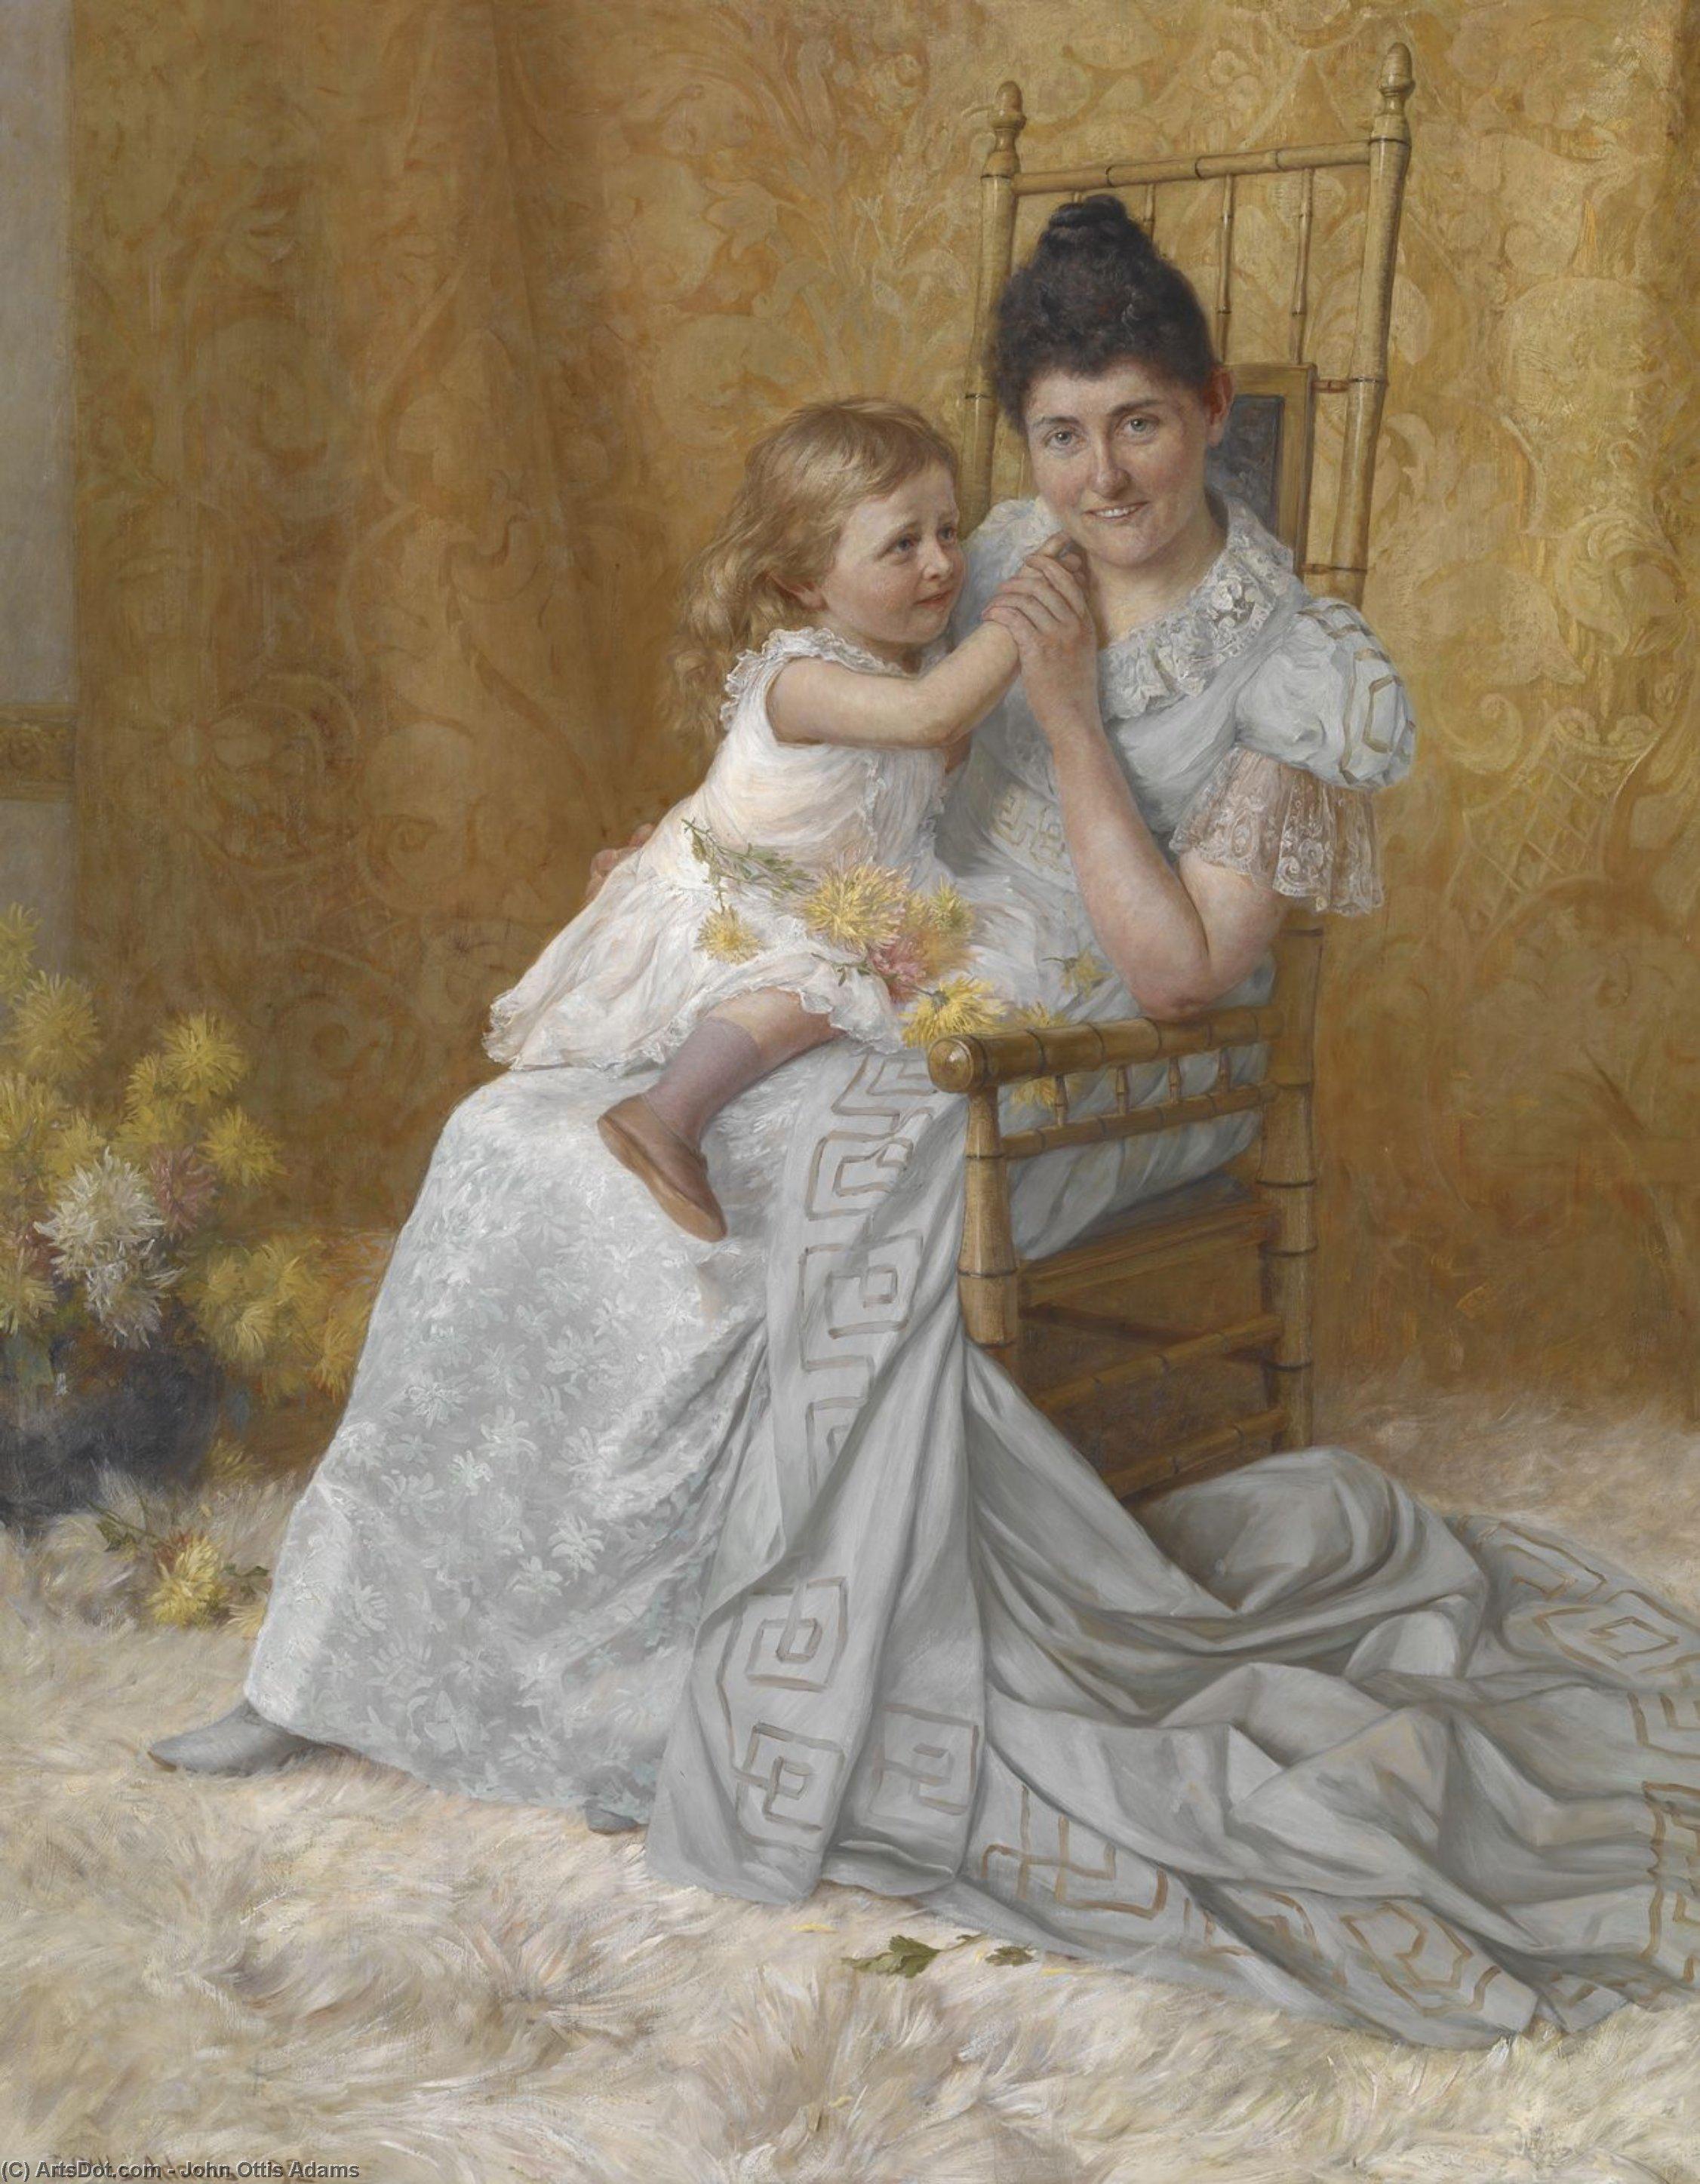 Wikioo.org - The Encyclopedia of Fine Arts - Painting, Artwork by John Ottis Adams - Portrait of Martha Wysor Marsh and Son, John Edwin